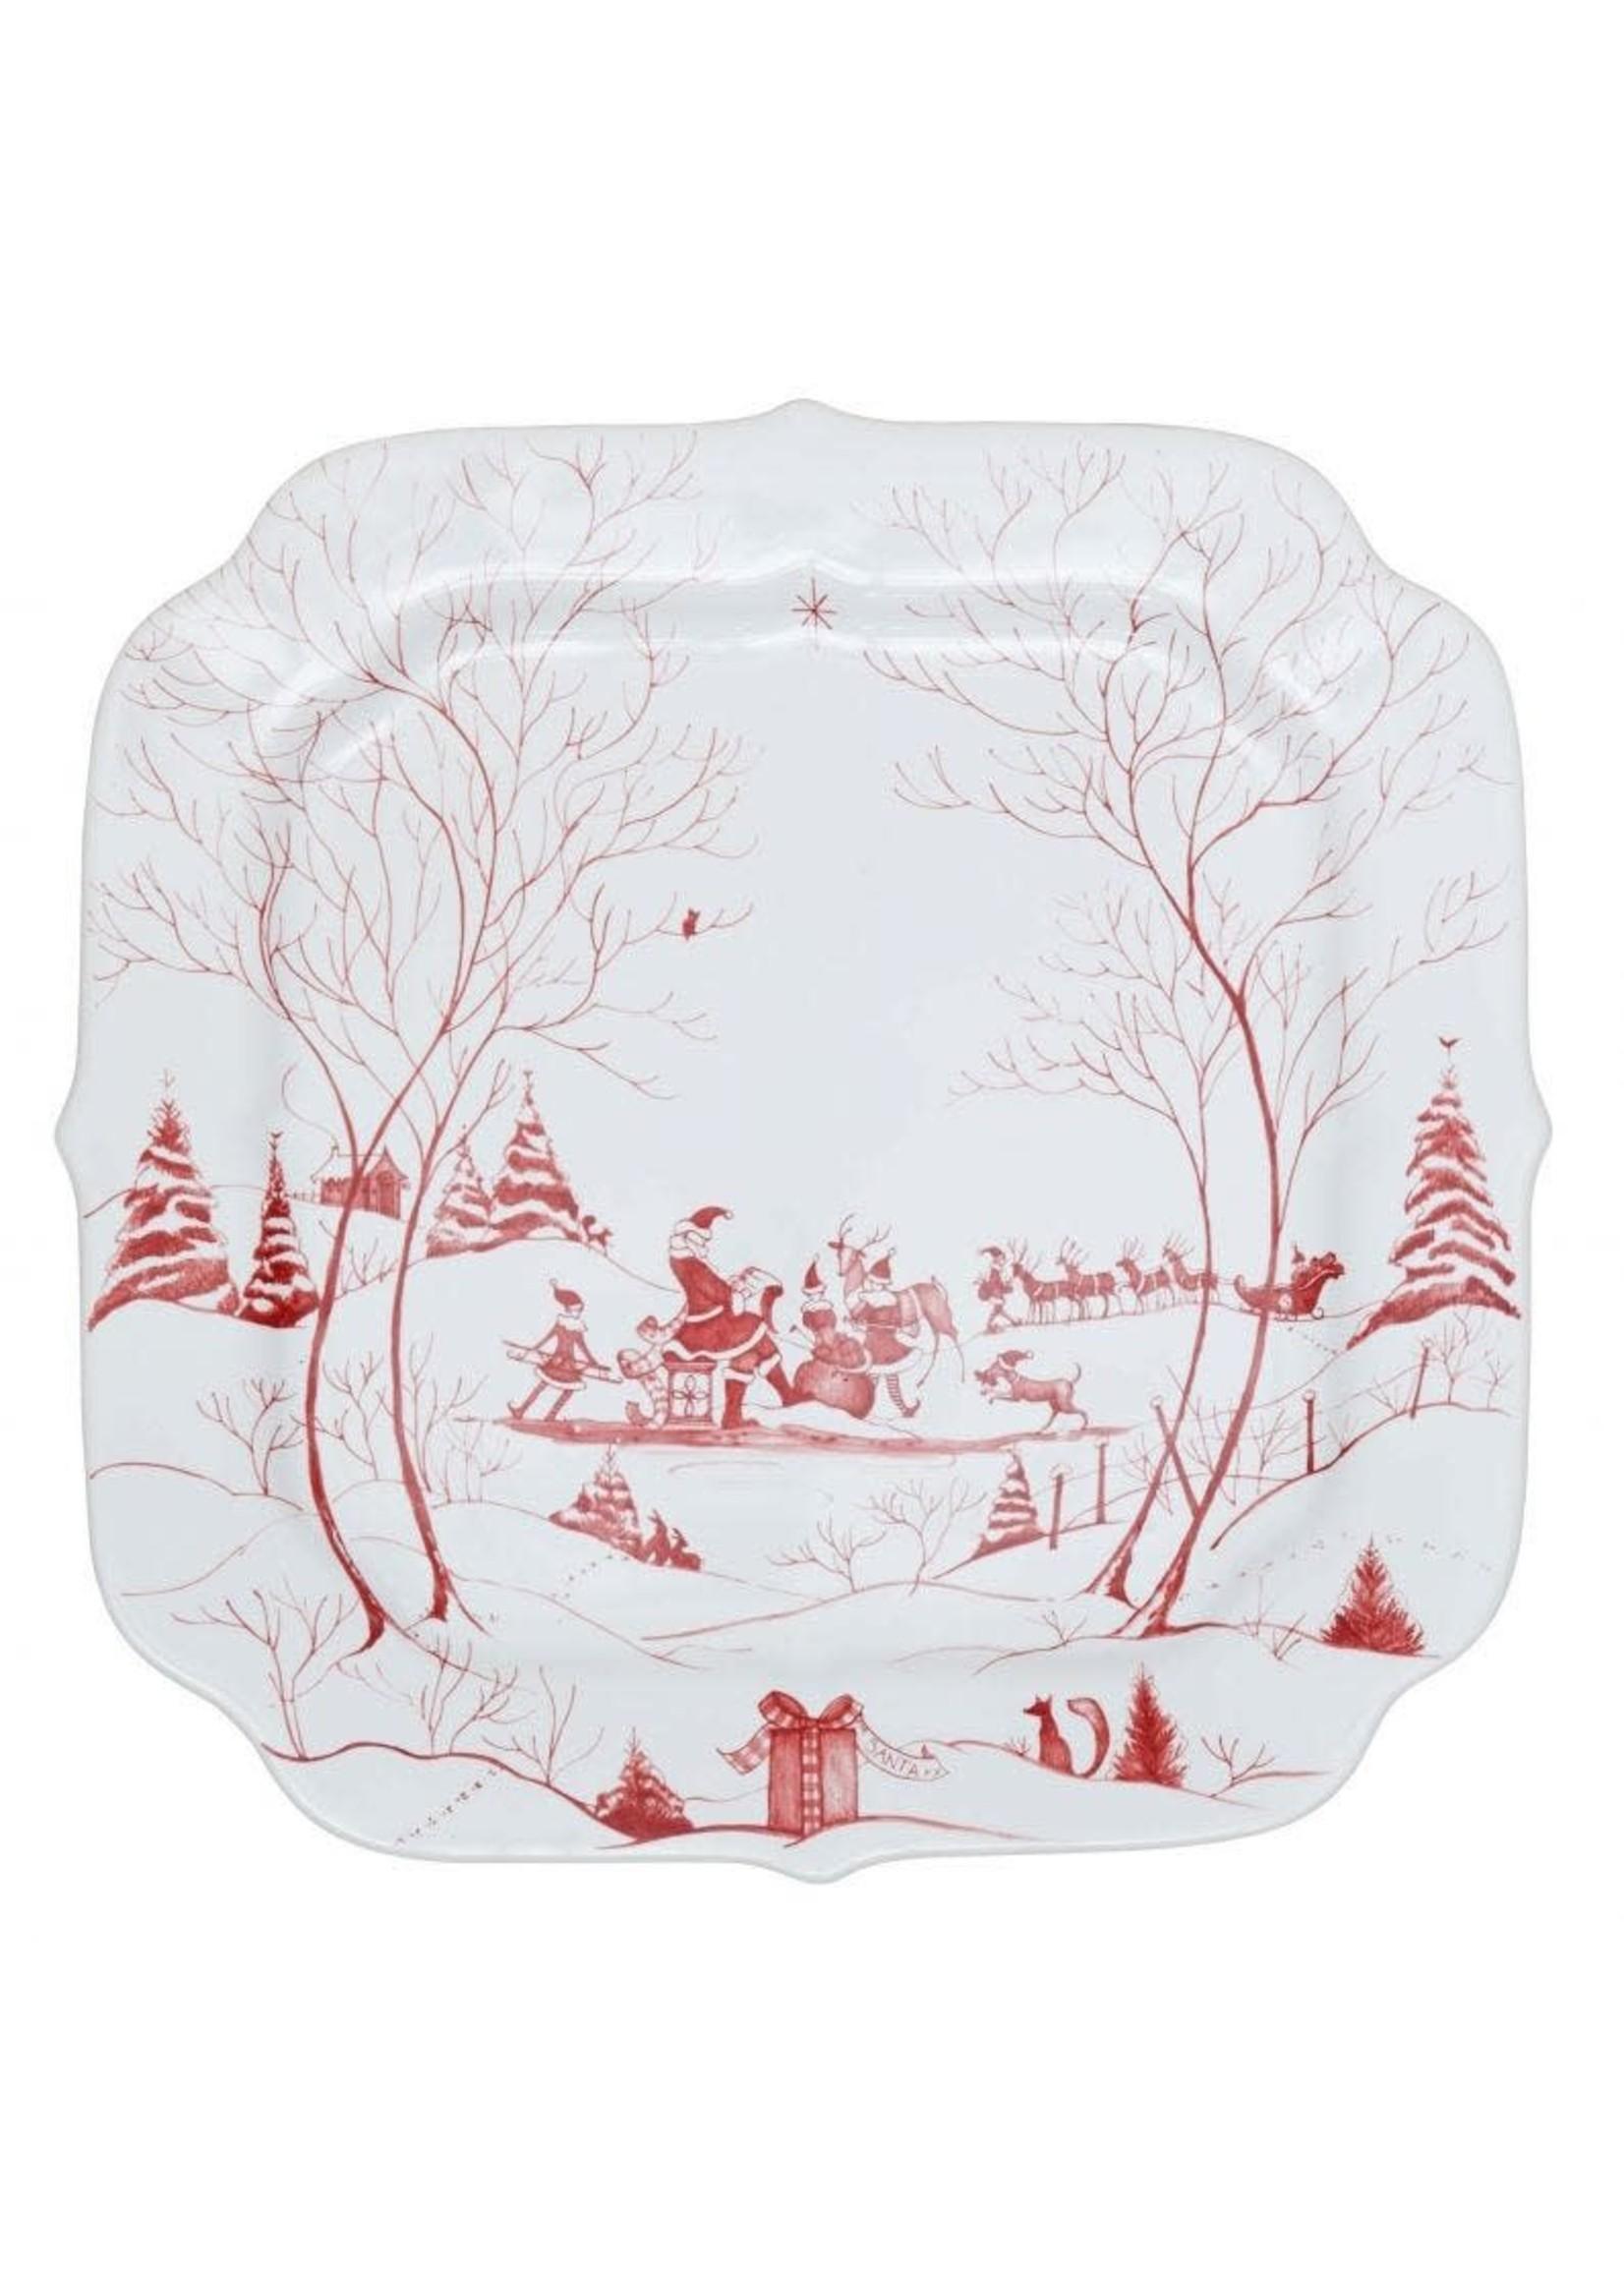 Juliska Country Estate - Ruby - Santa's Cookie Tray - Winter Frolic